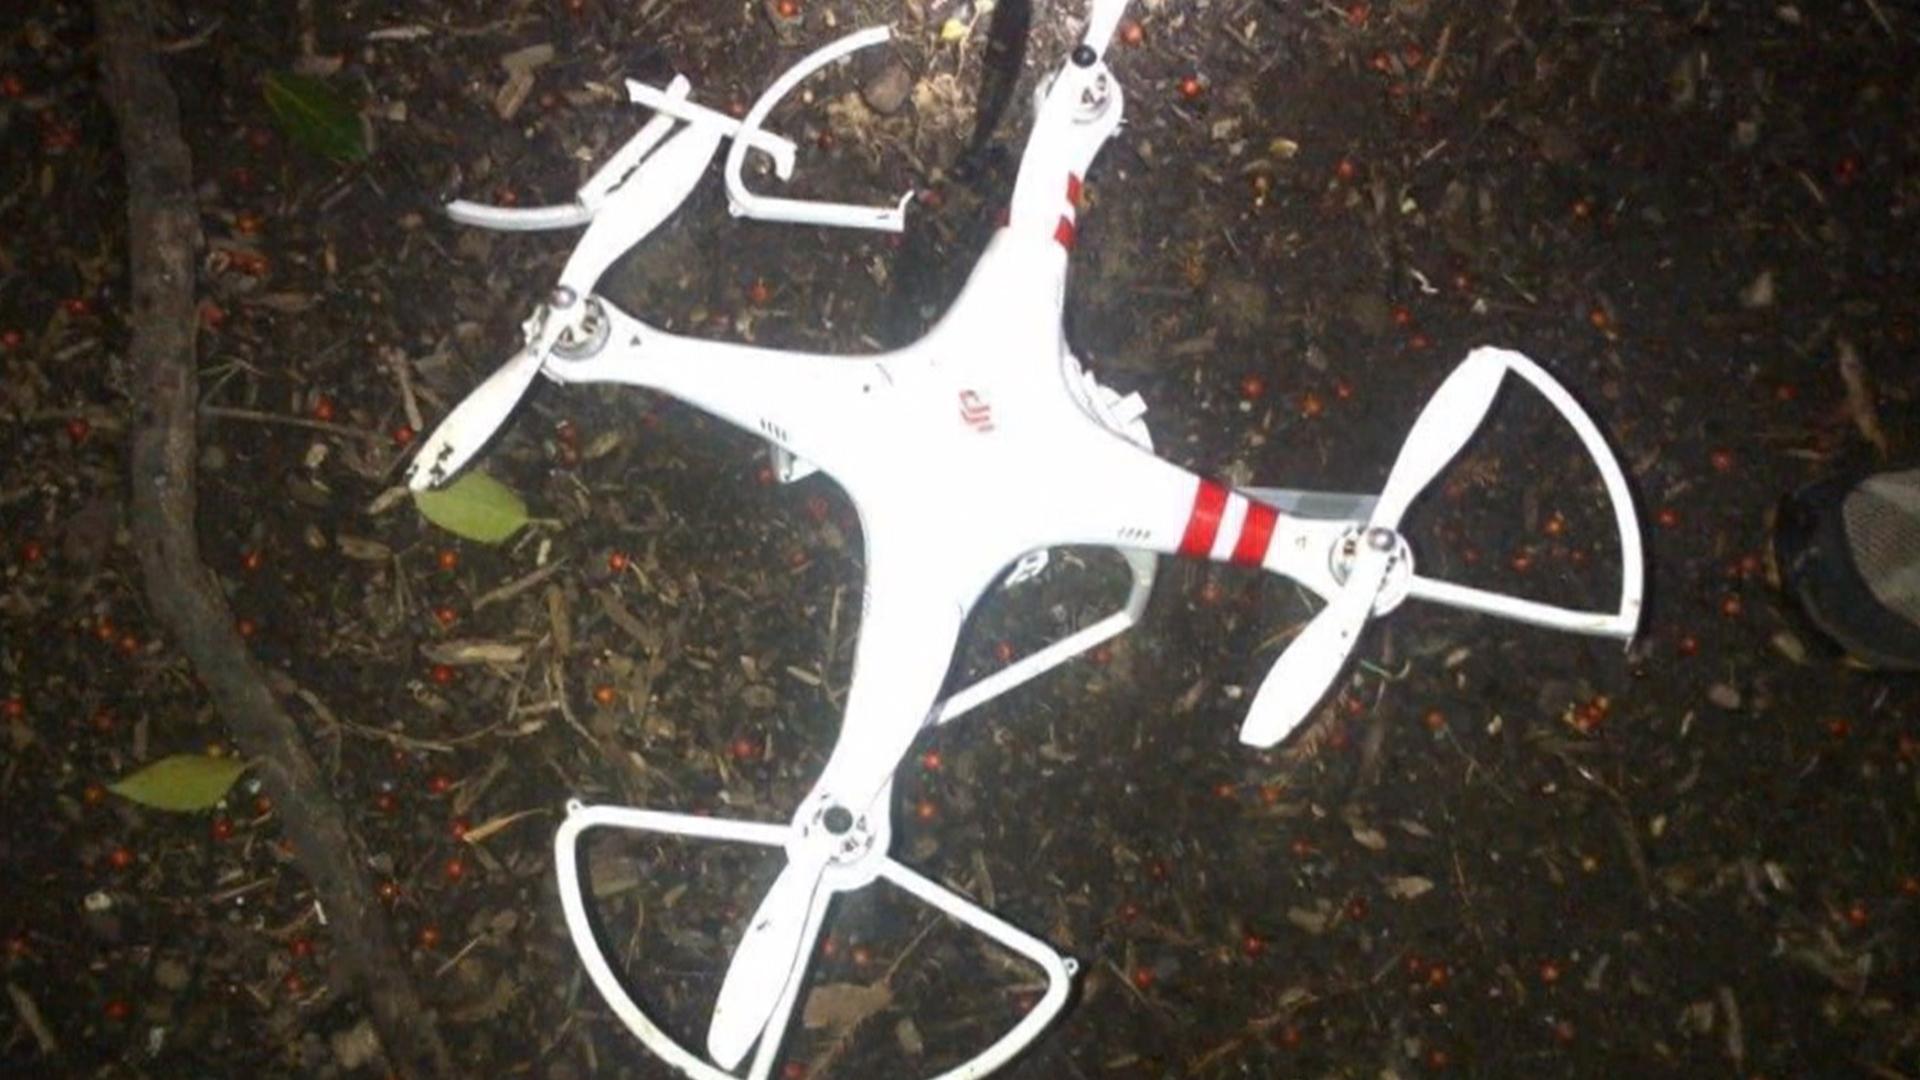 Damaged DJI Drone